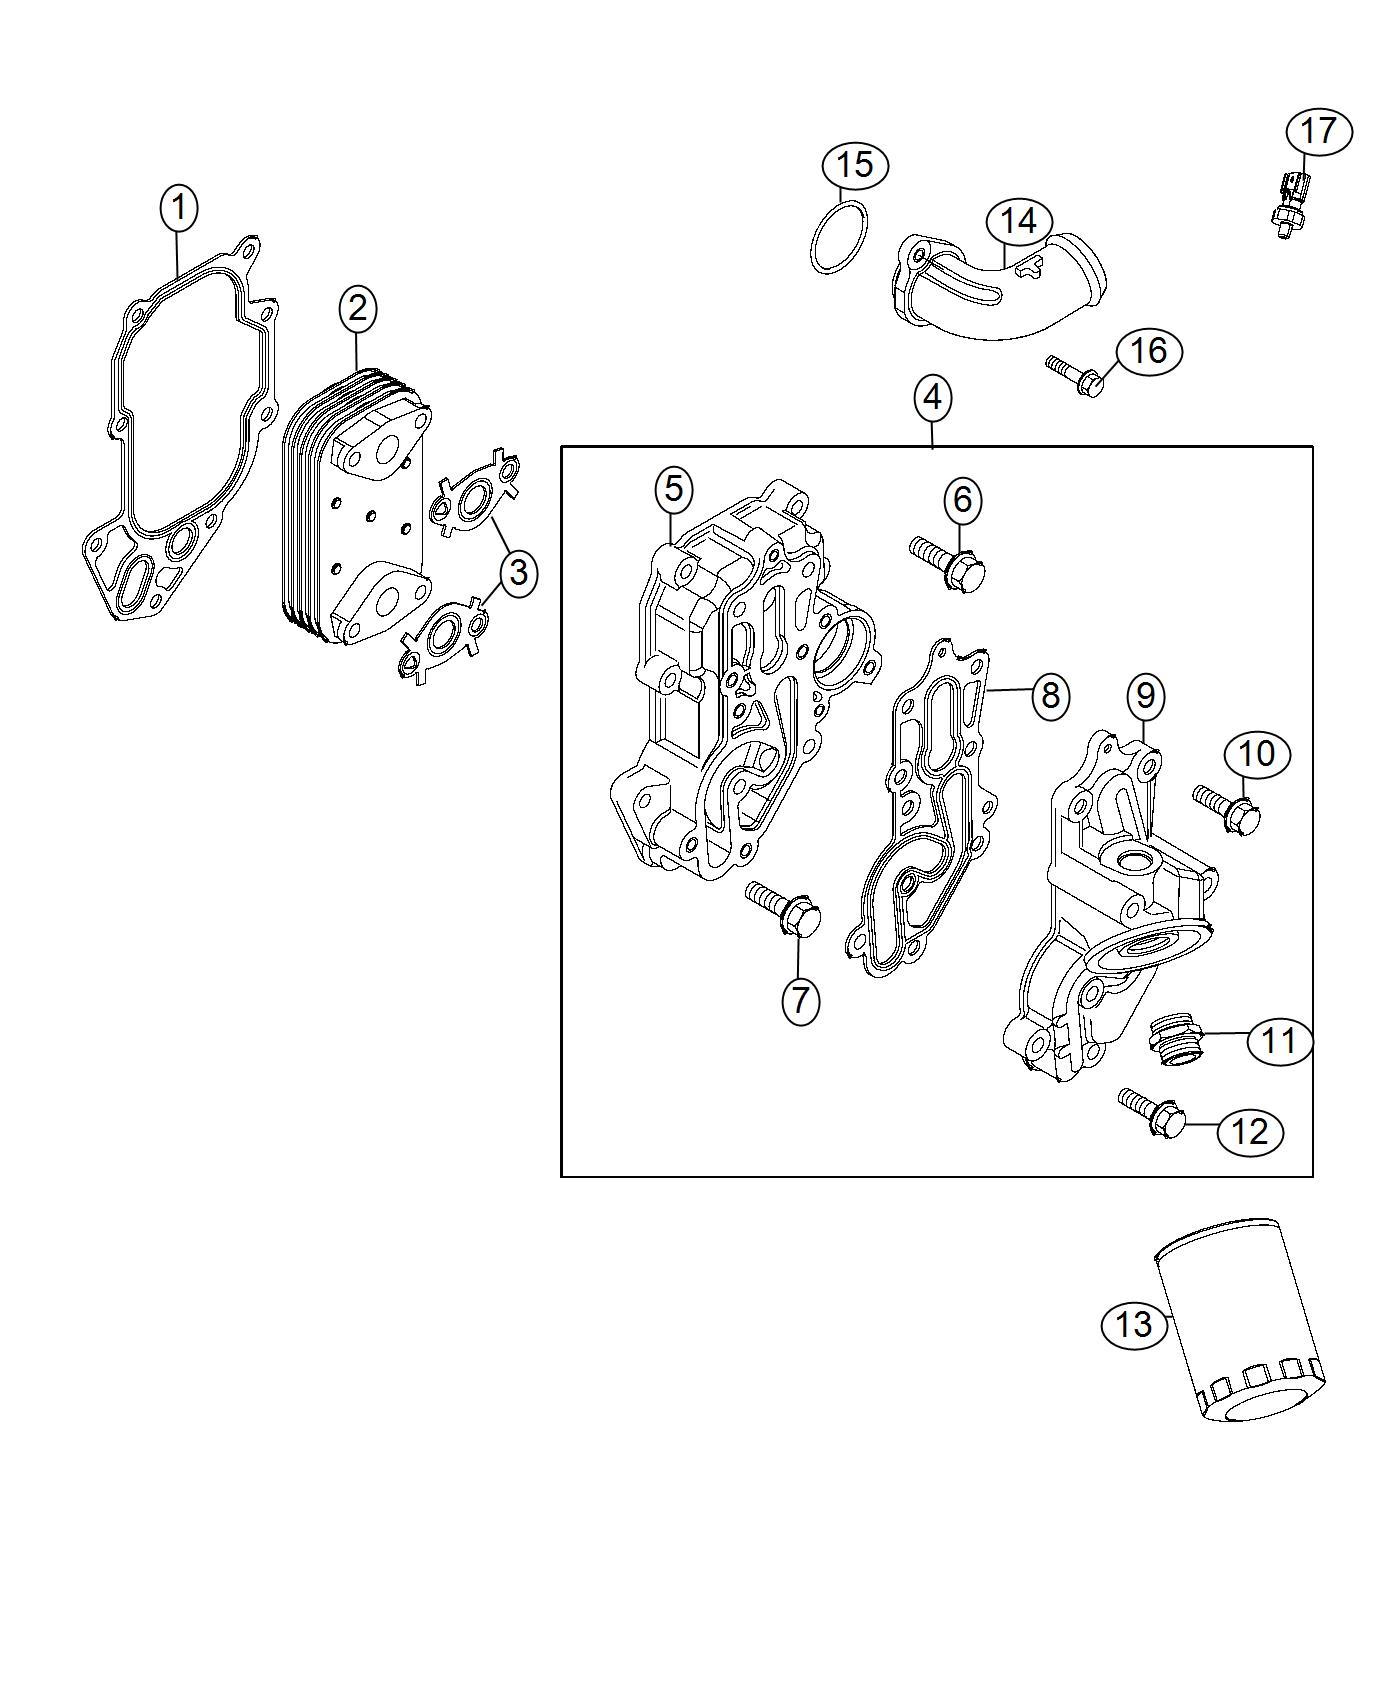 Dodge Ram Connector 02 St